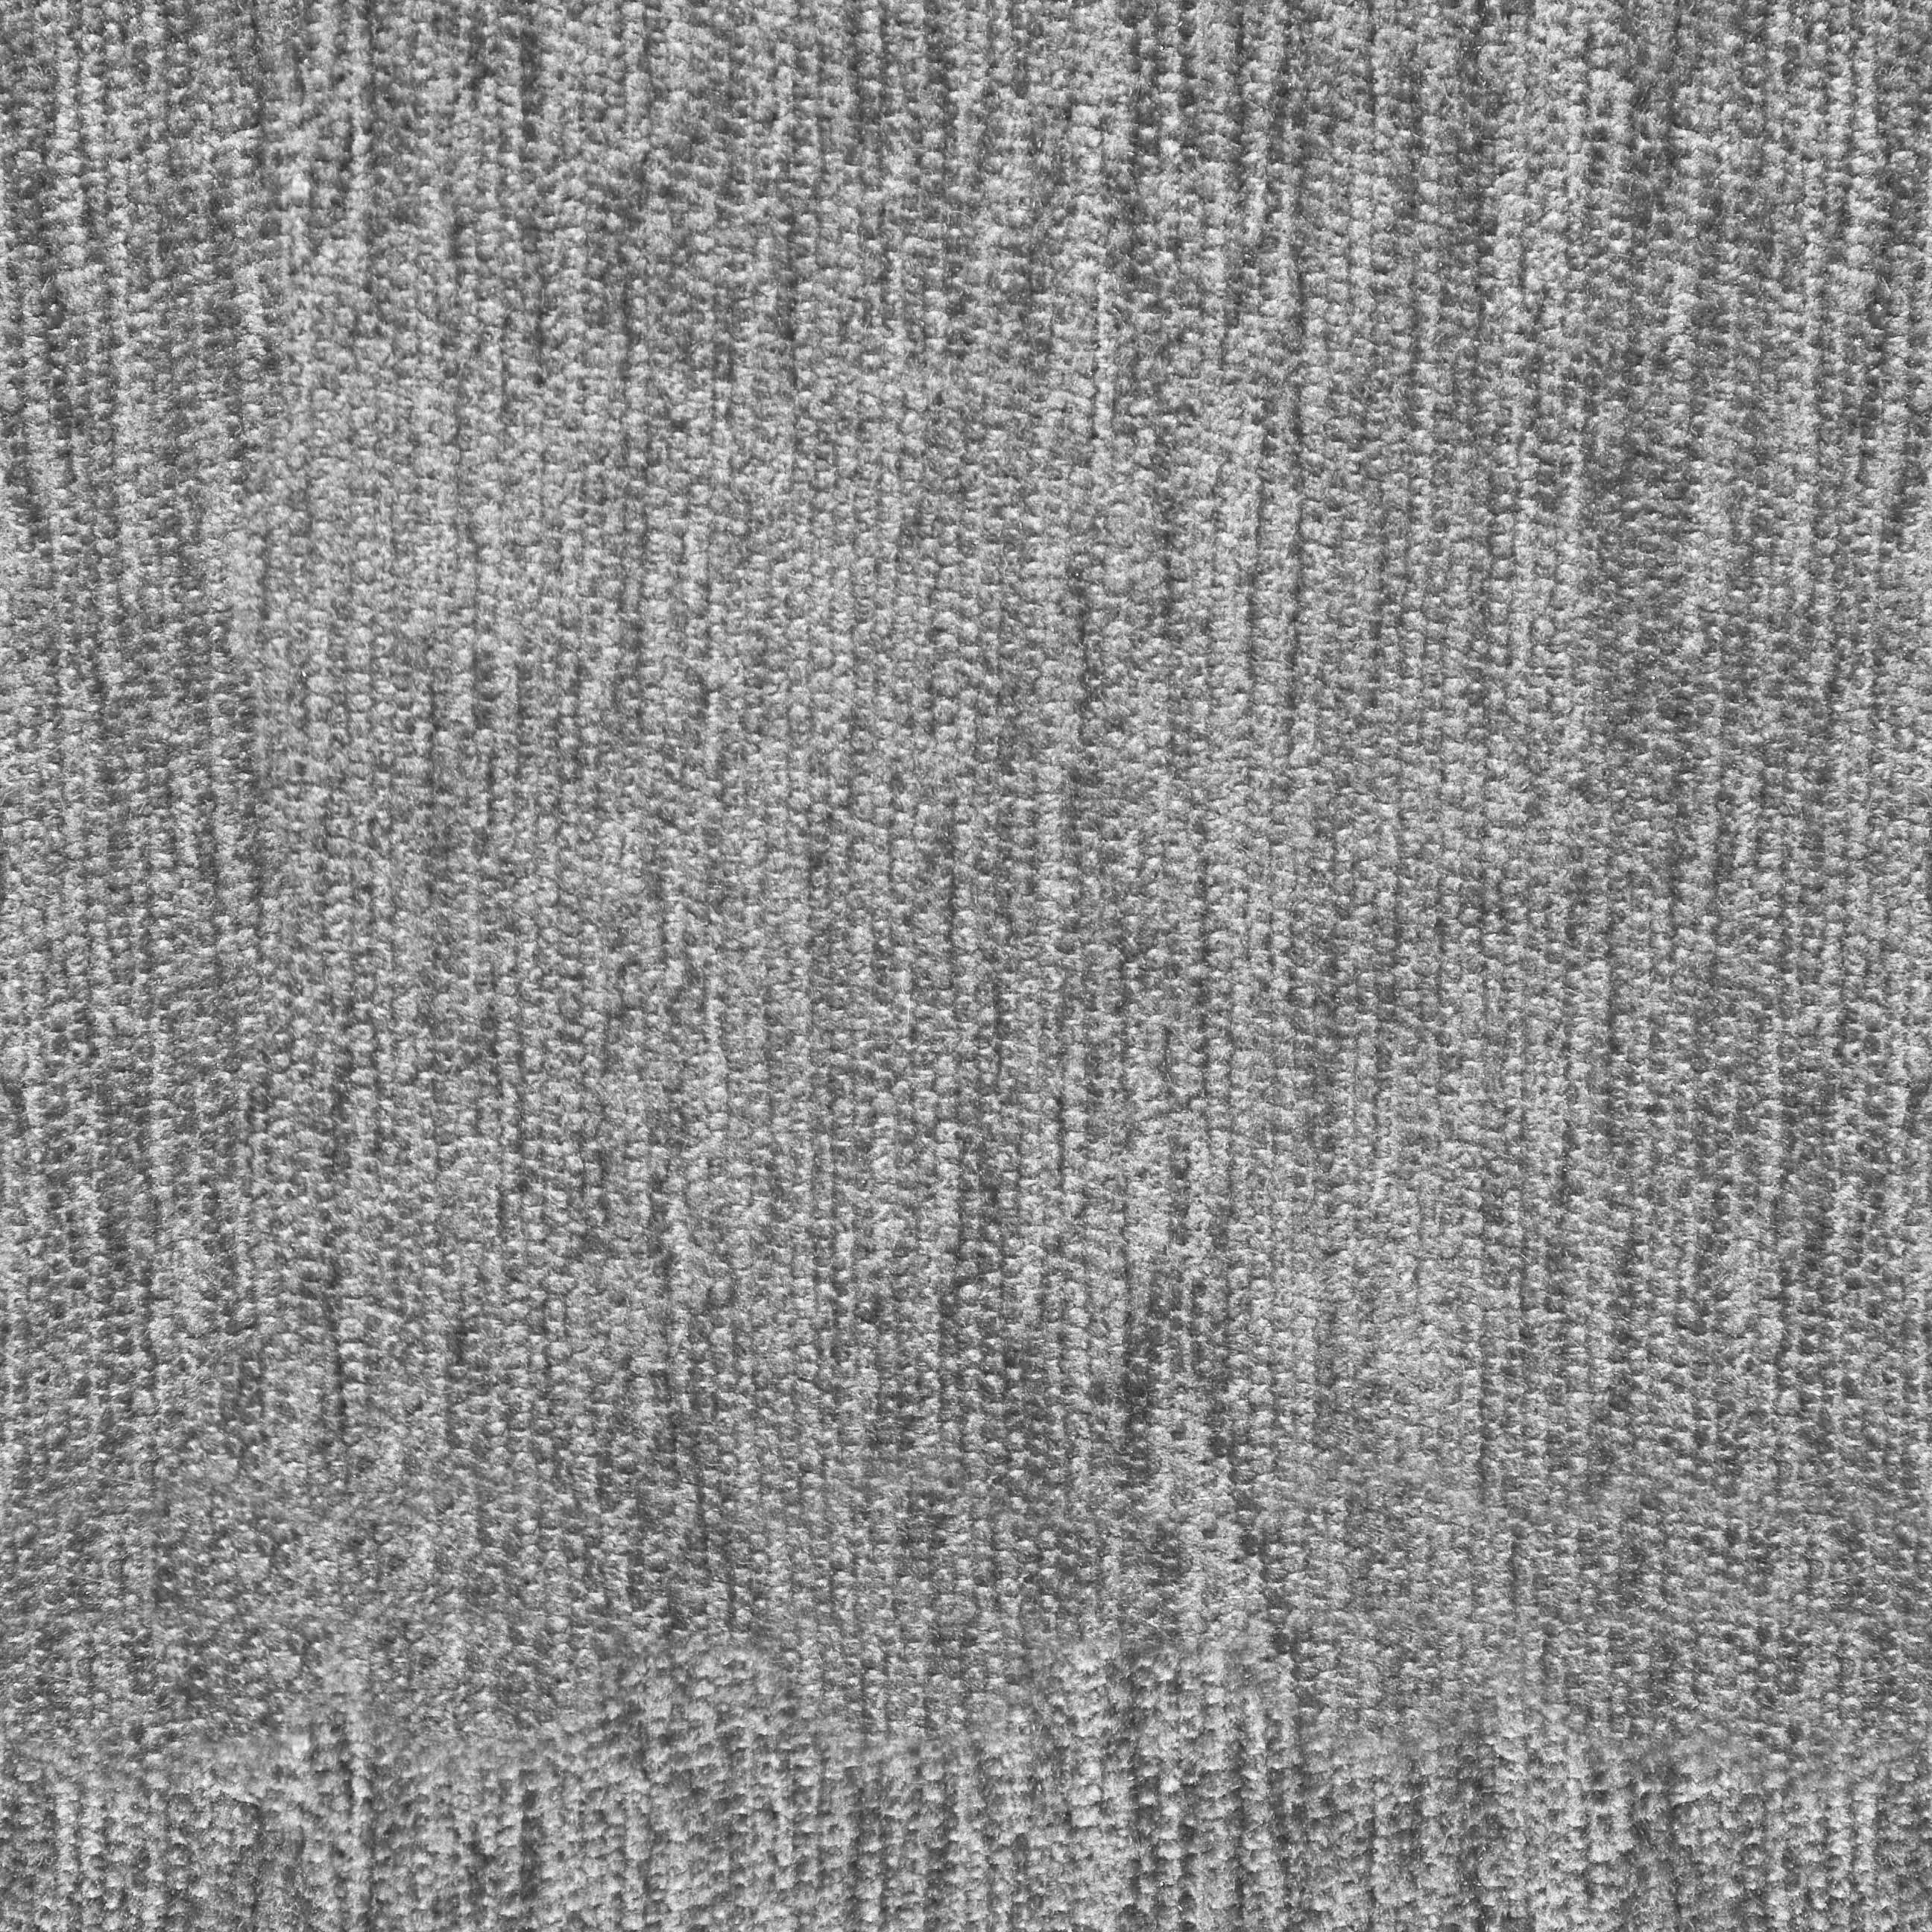 seamless-fabric-bump-map.jpg (2592×2592)